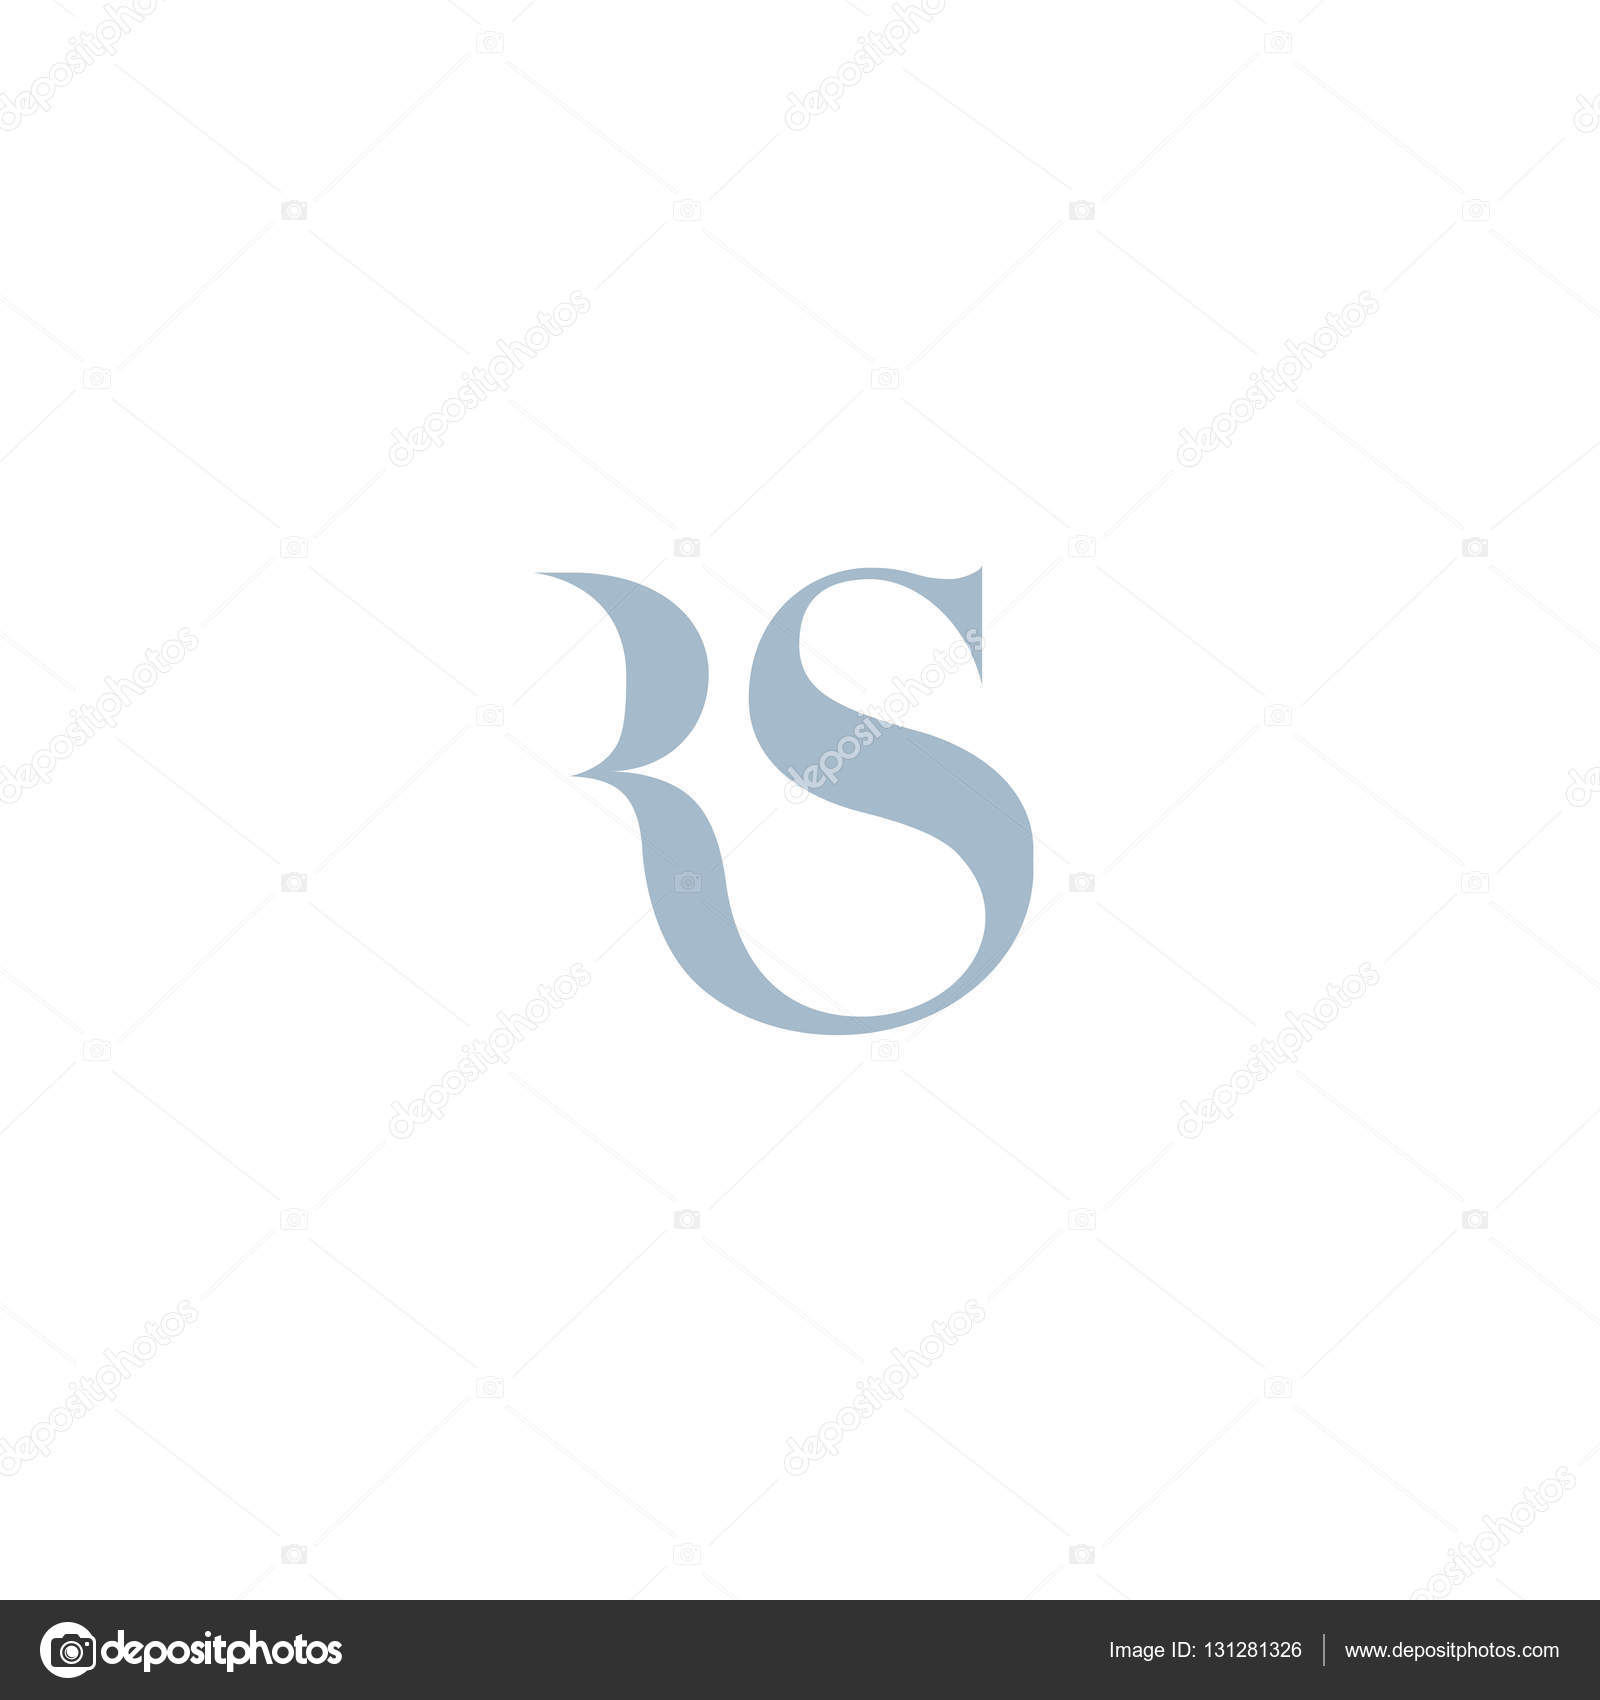 Rs letter logo stock vector brainbistro 131281326 rs letter logo stock vector buycottarizona Image collections